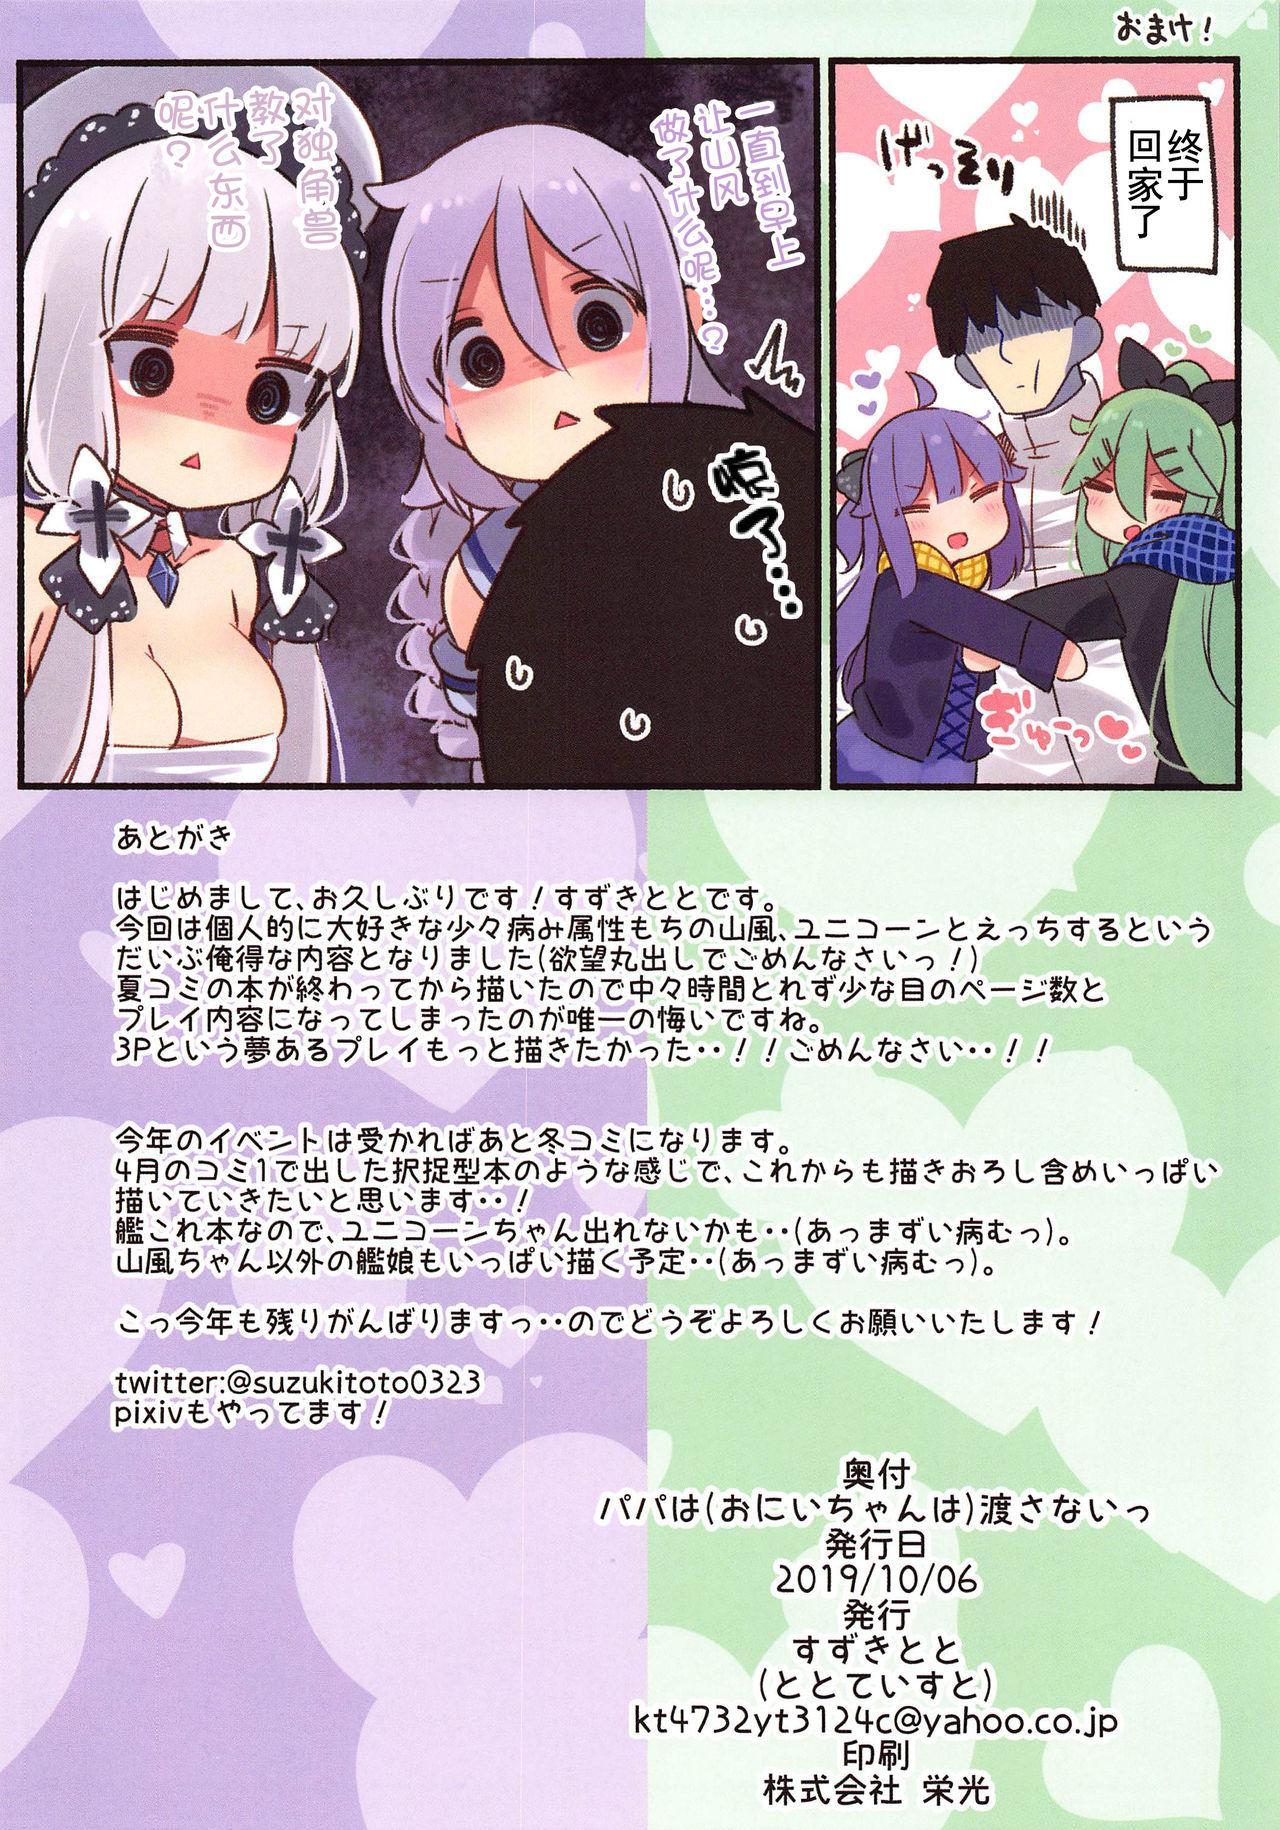 (COMIC1☆16) [Toto-taste (Suzuki Toto)] Papa wa (Onii-chan wa) Watasanai (Kantai Collection -KanColle-, Azur Lane) [Chinese] [钢华团汉化组] 20